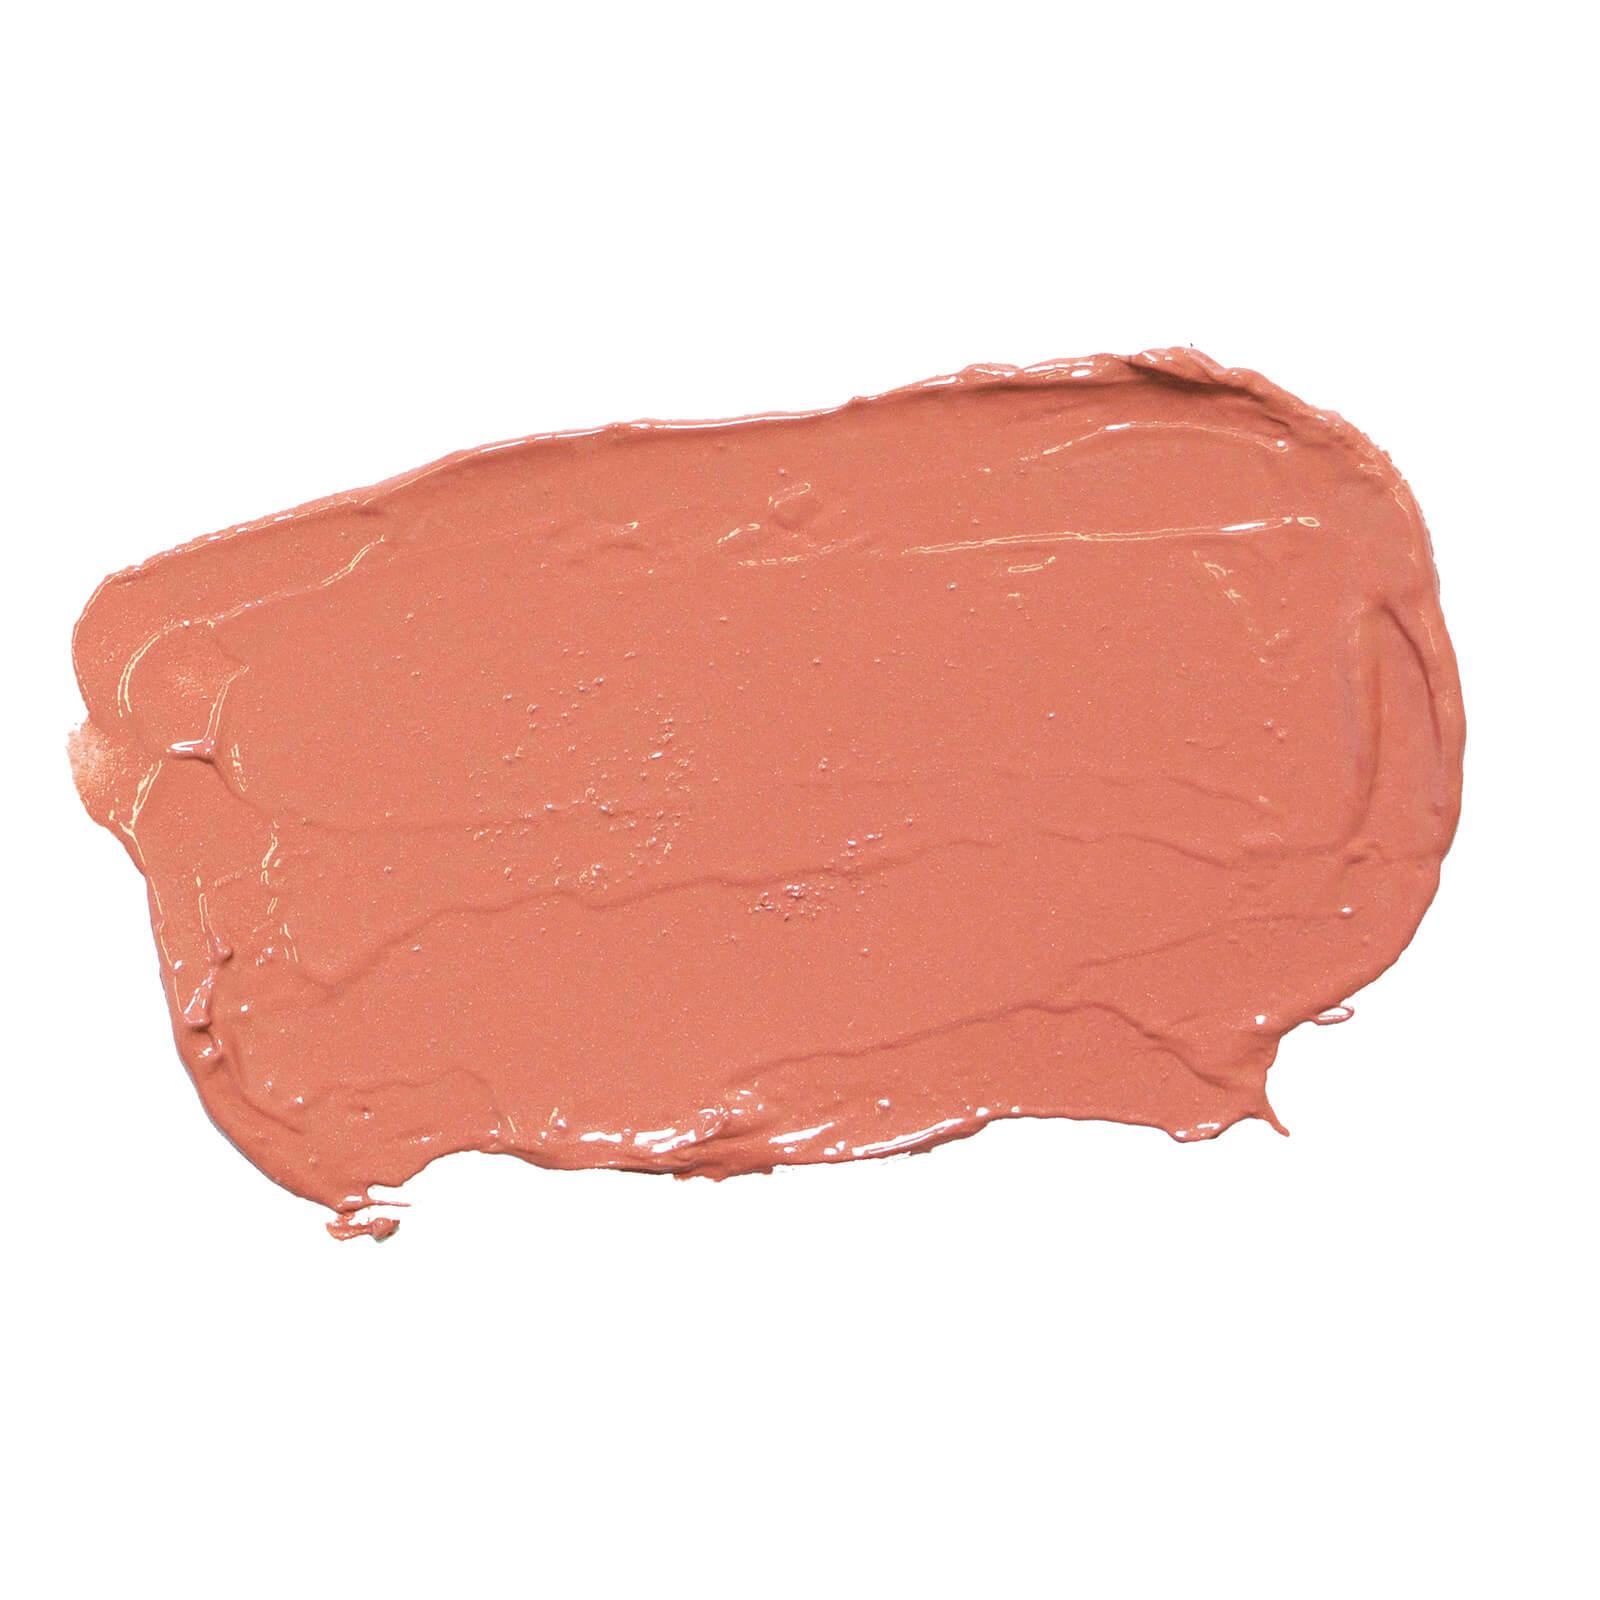 NUDESTIX Gel Colour Lip and Cheek Balm 2.8g (Various Shades) - Luxe